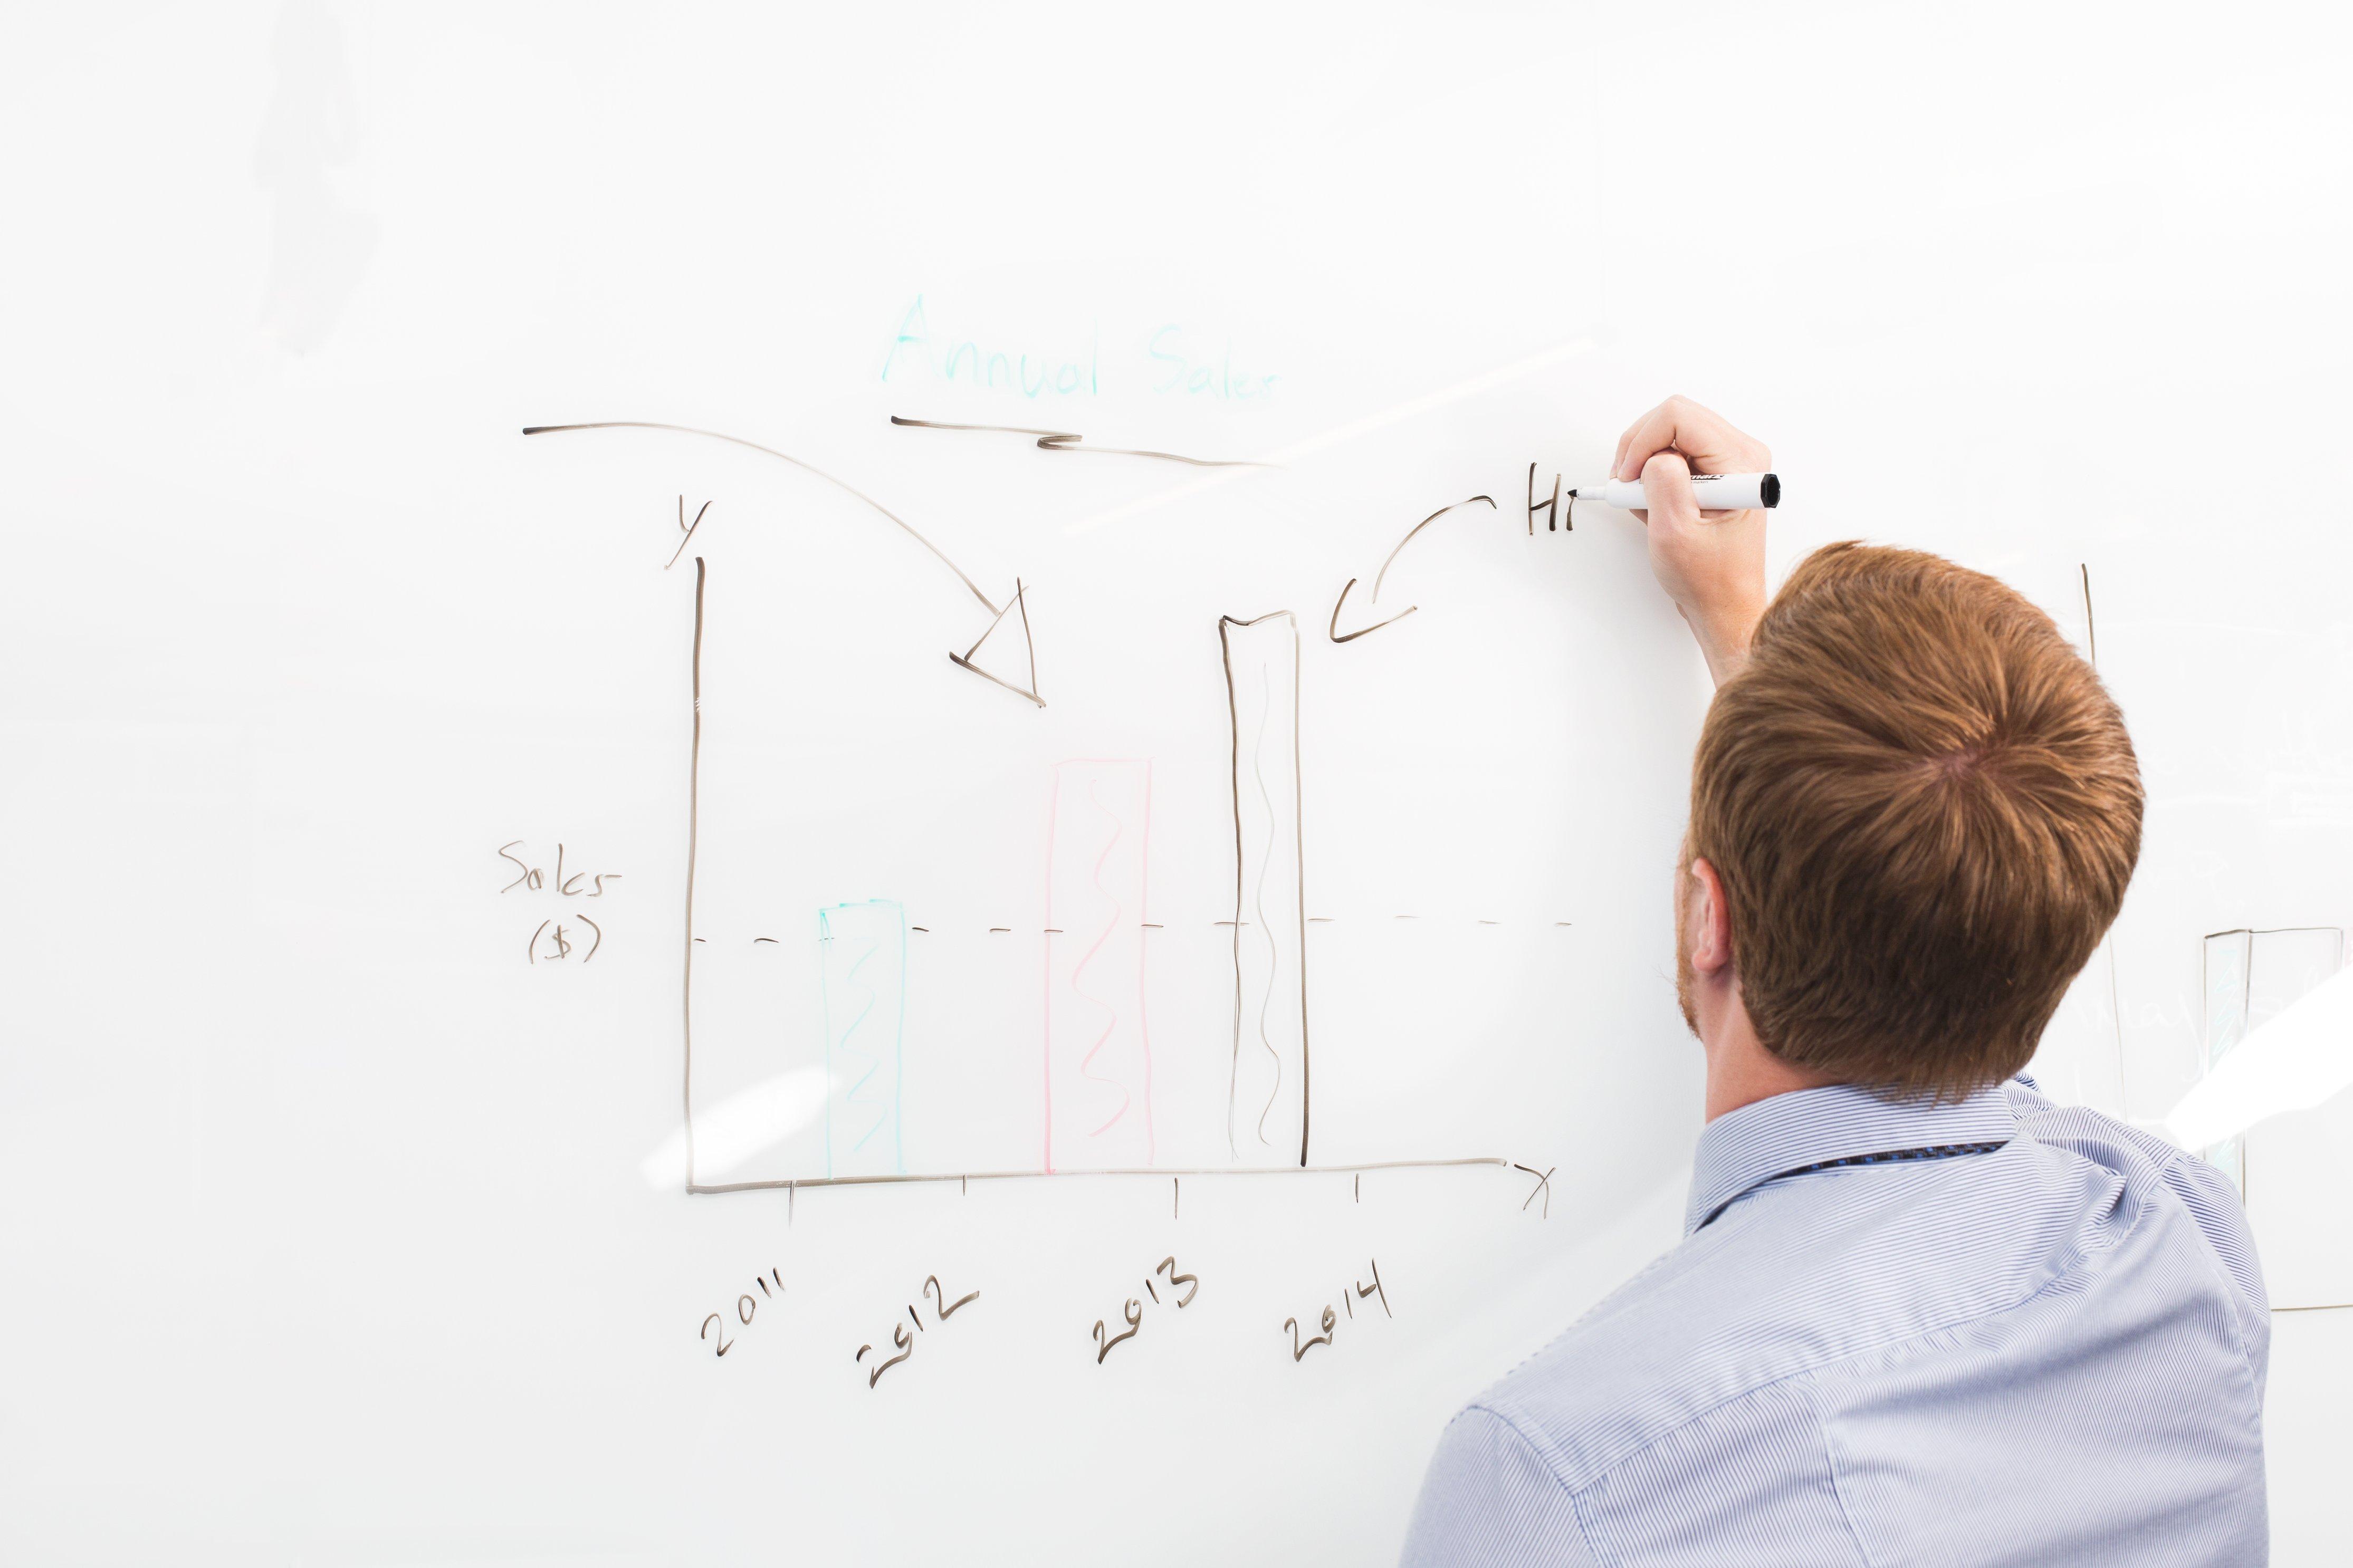 whiteboard-chart_4460x4460.jpg